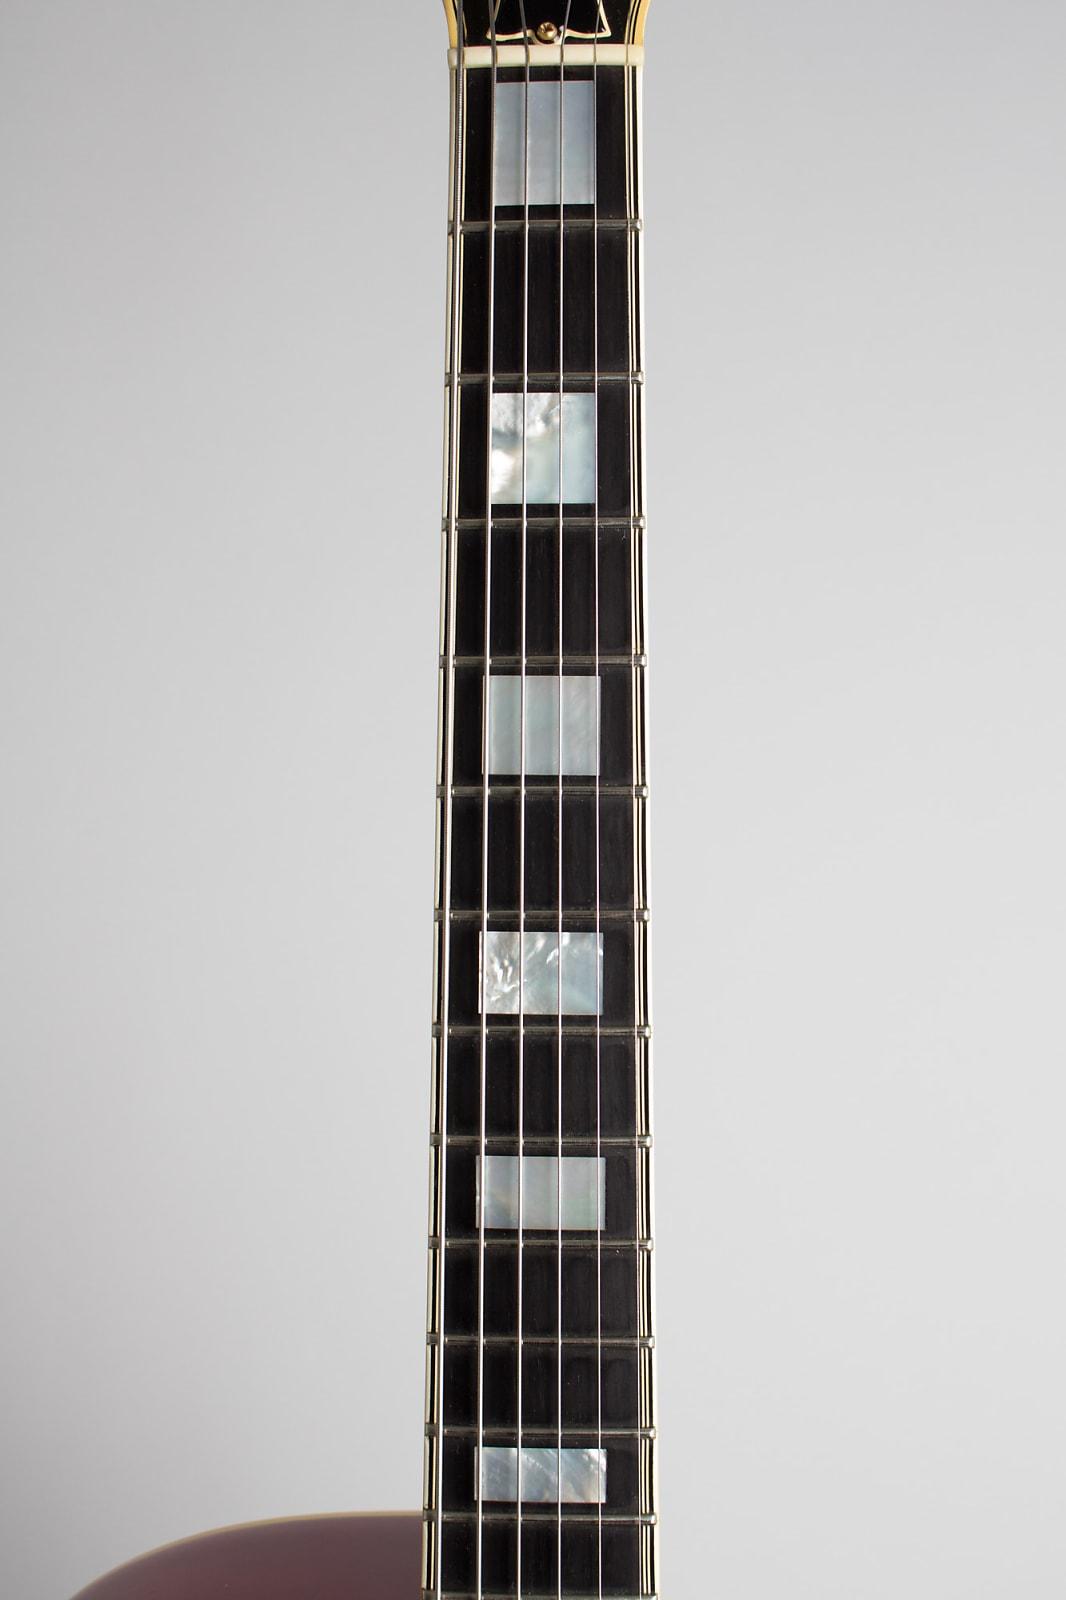 Gibson  L-5CES Arch Top Hollow Body Electric Guitar (1976), ser. #00204745, original black tolex hard shell case.